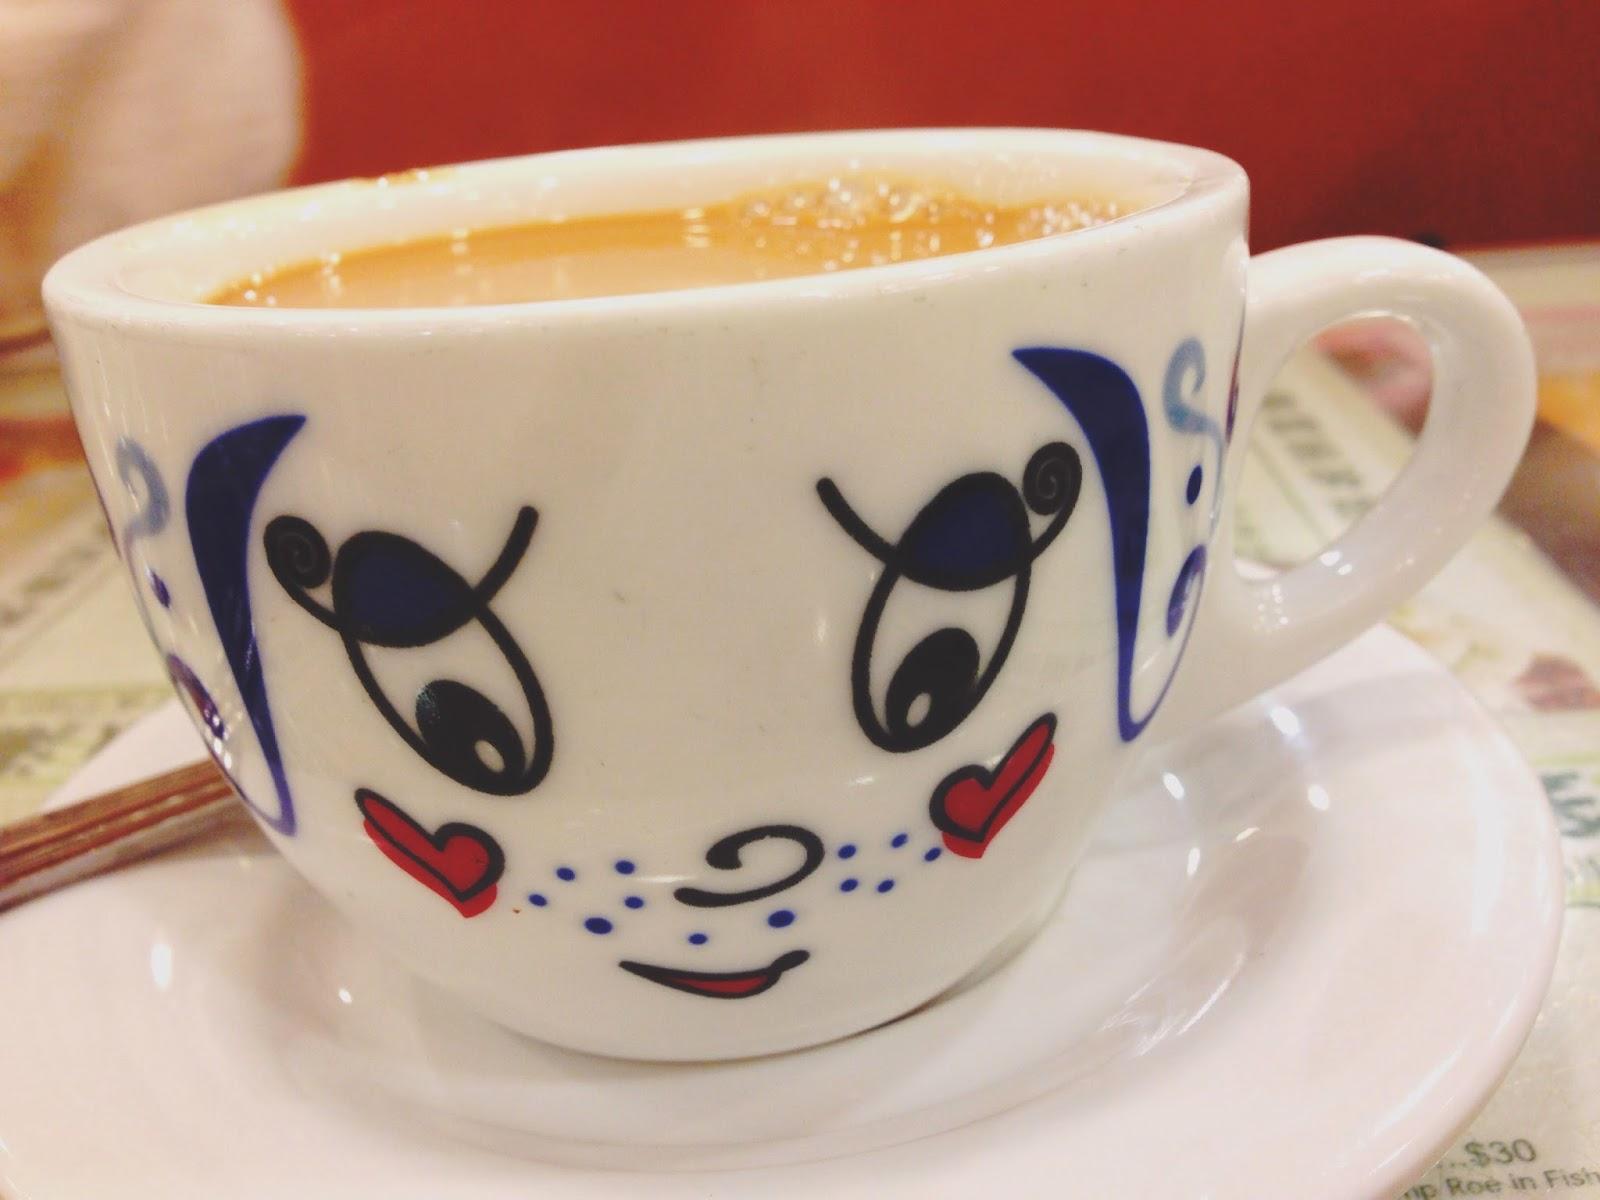 Tsui Wah Restaurant Hong Kong Milk Tea